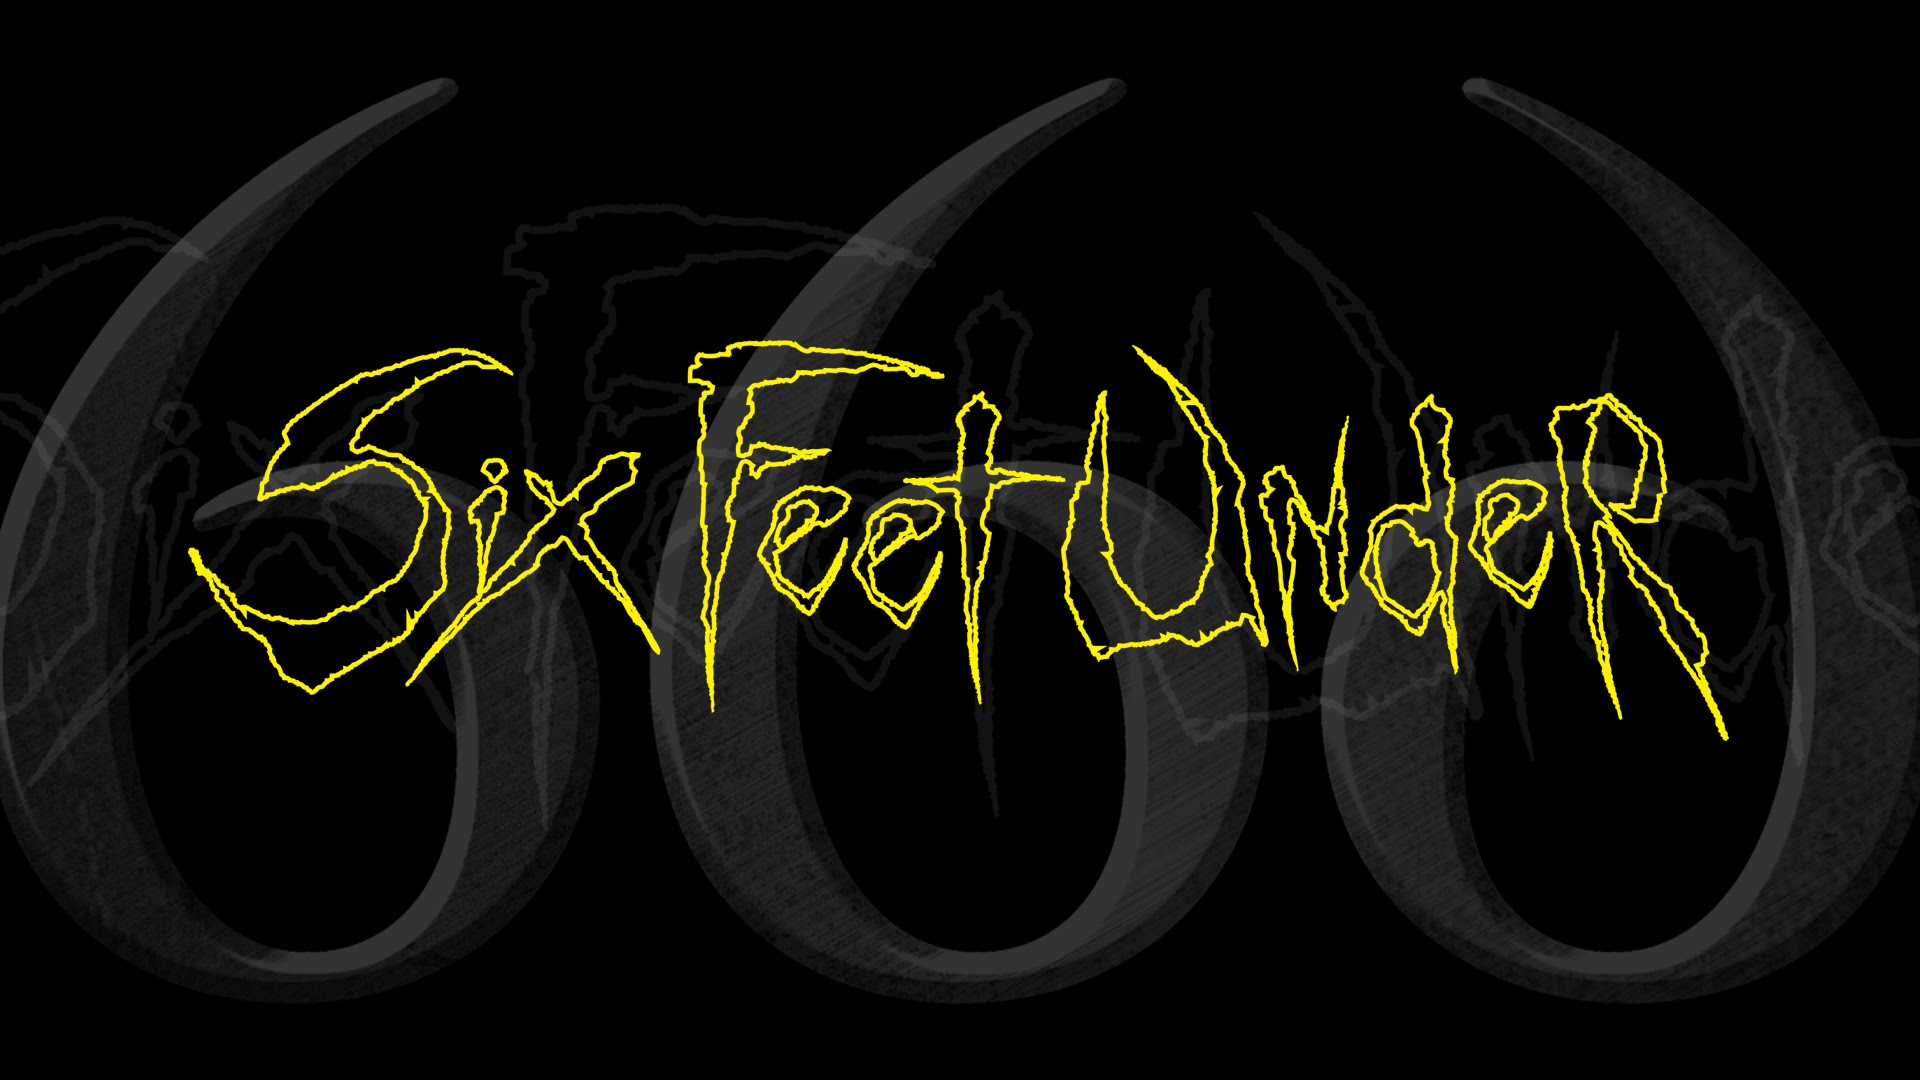 Six Feet Under 'Invader' (OFFICIAL)